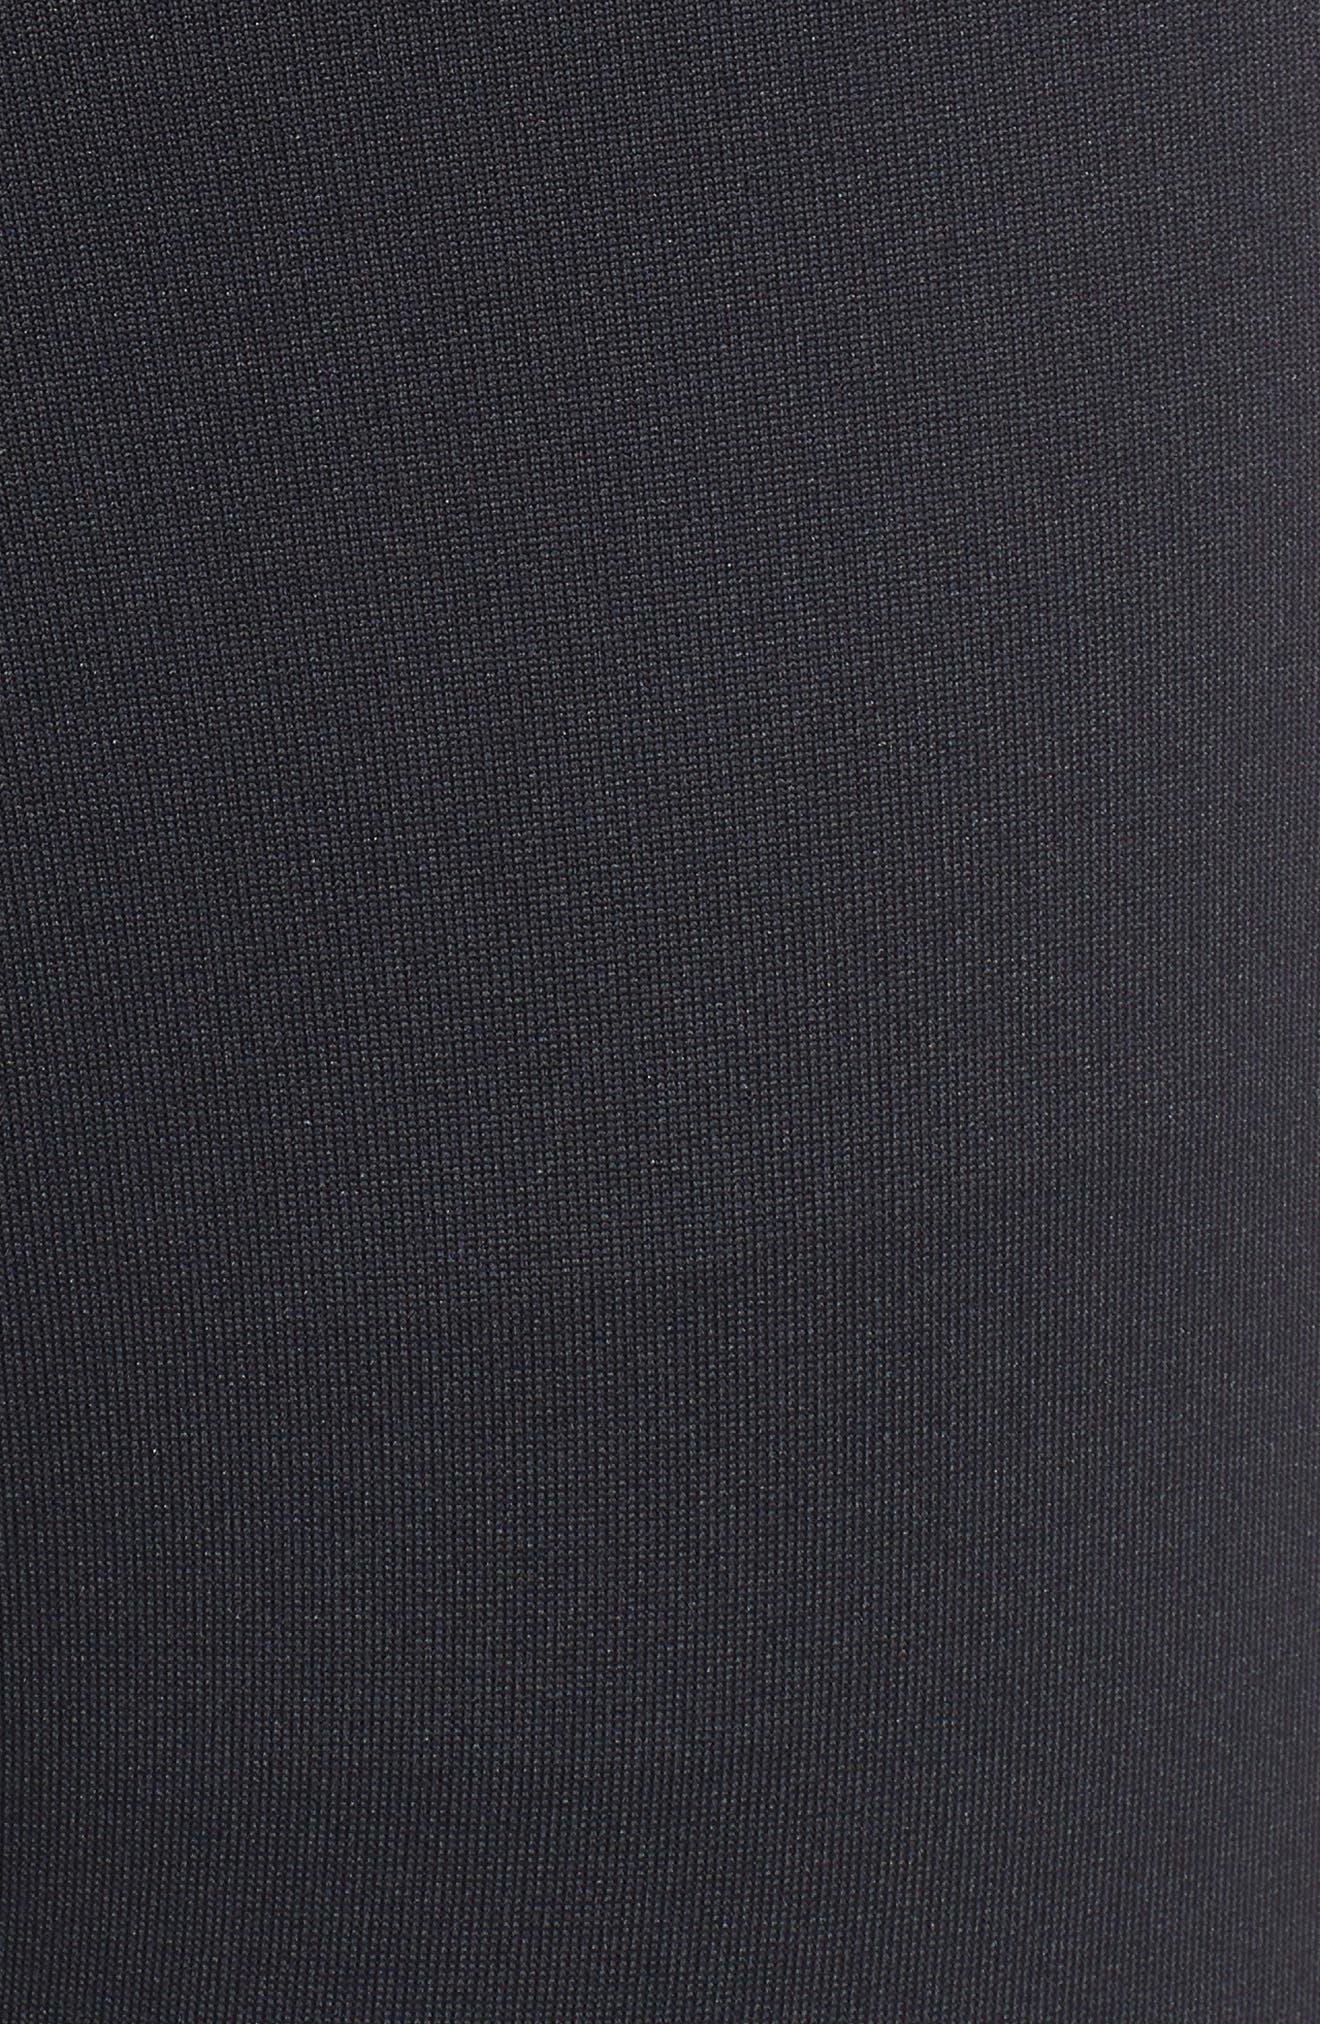 ColdGear<sup>®</sup> Leggings,                             Alternate thumbnail 5, color,                             BLACK/ CHARCOAL